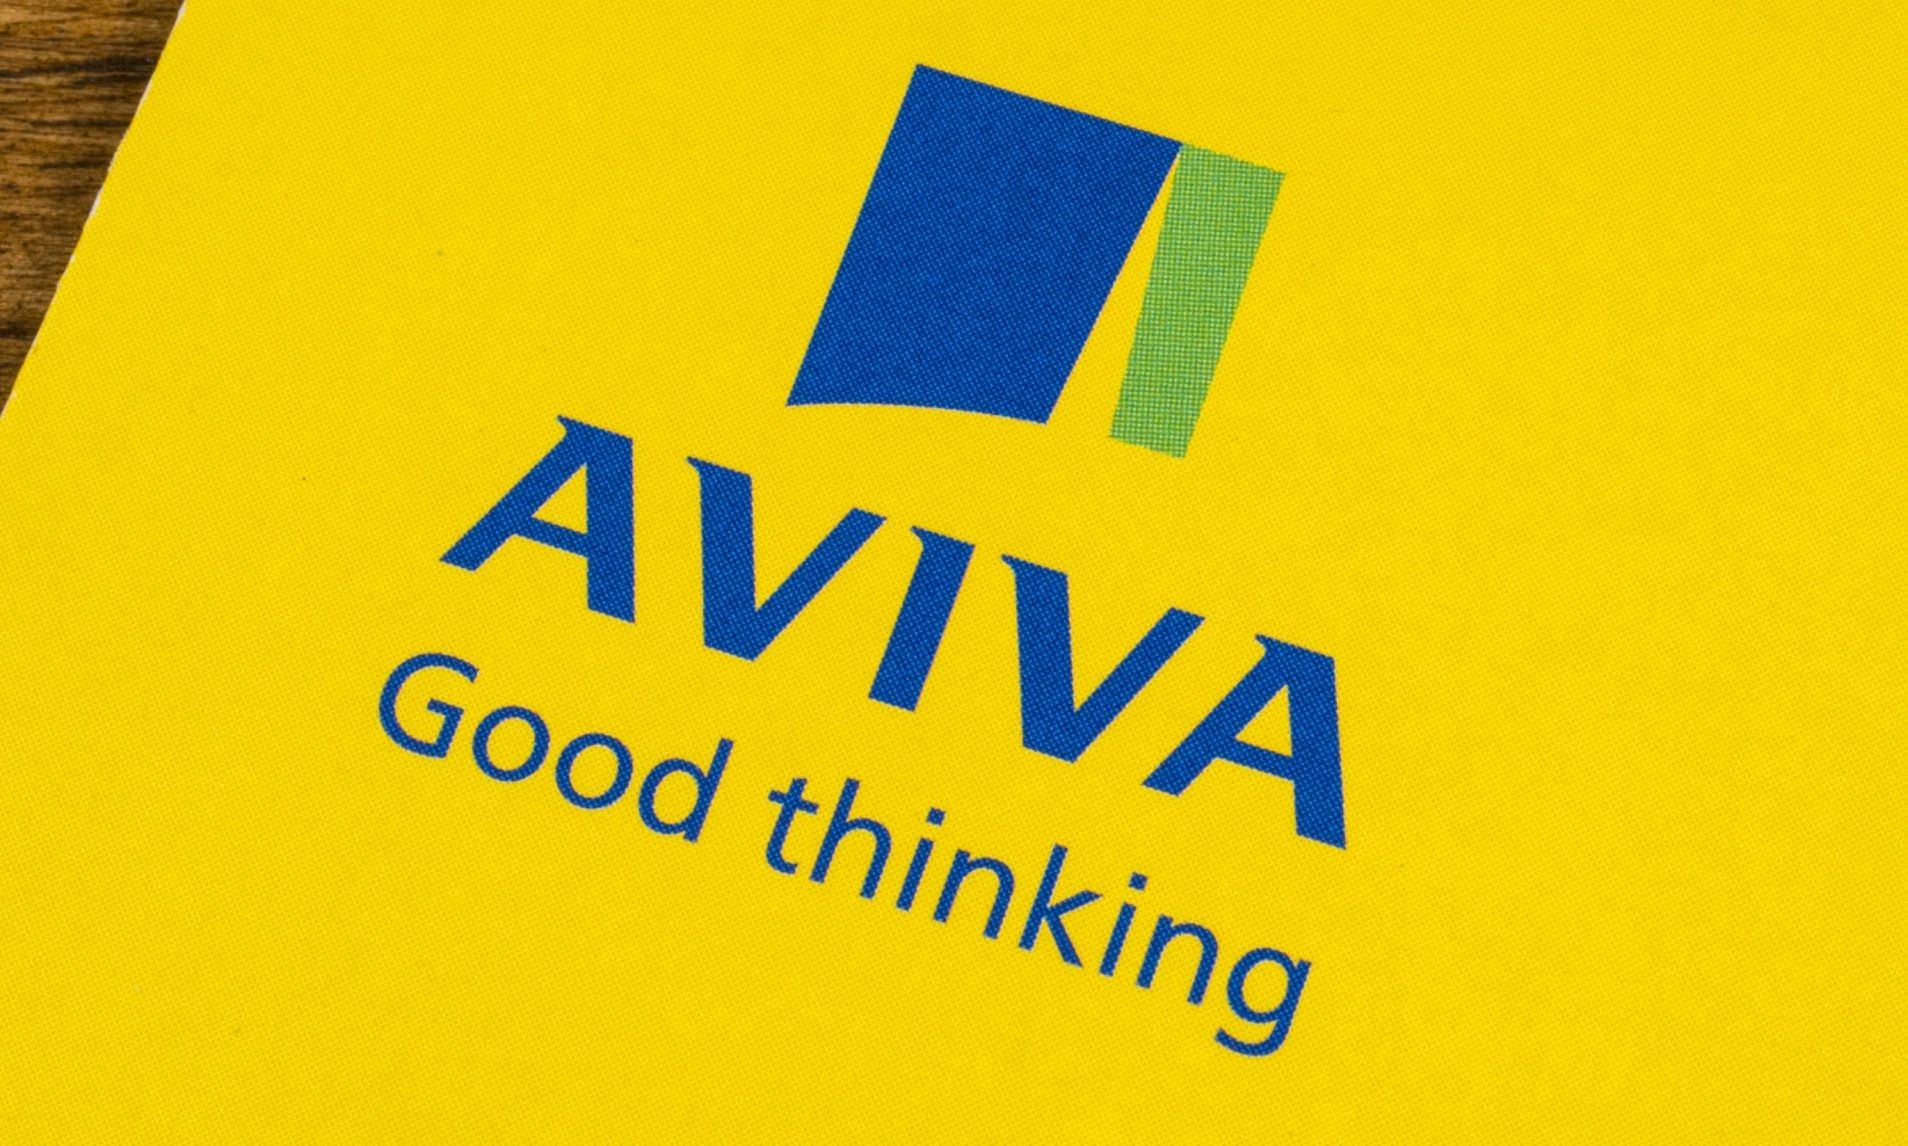 Aviva plc 2020 announces interim dividend of 7.0 pence per share